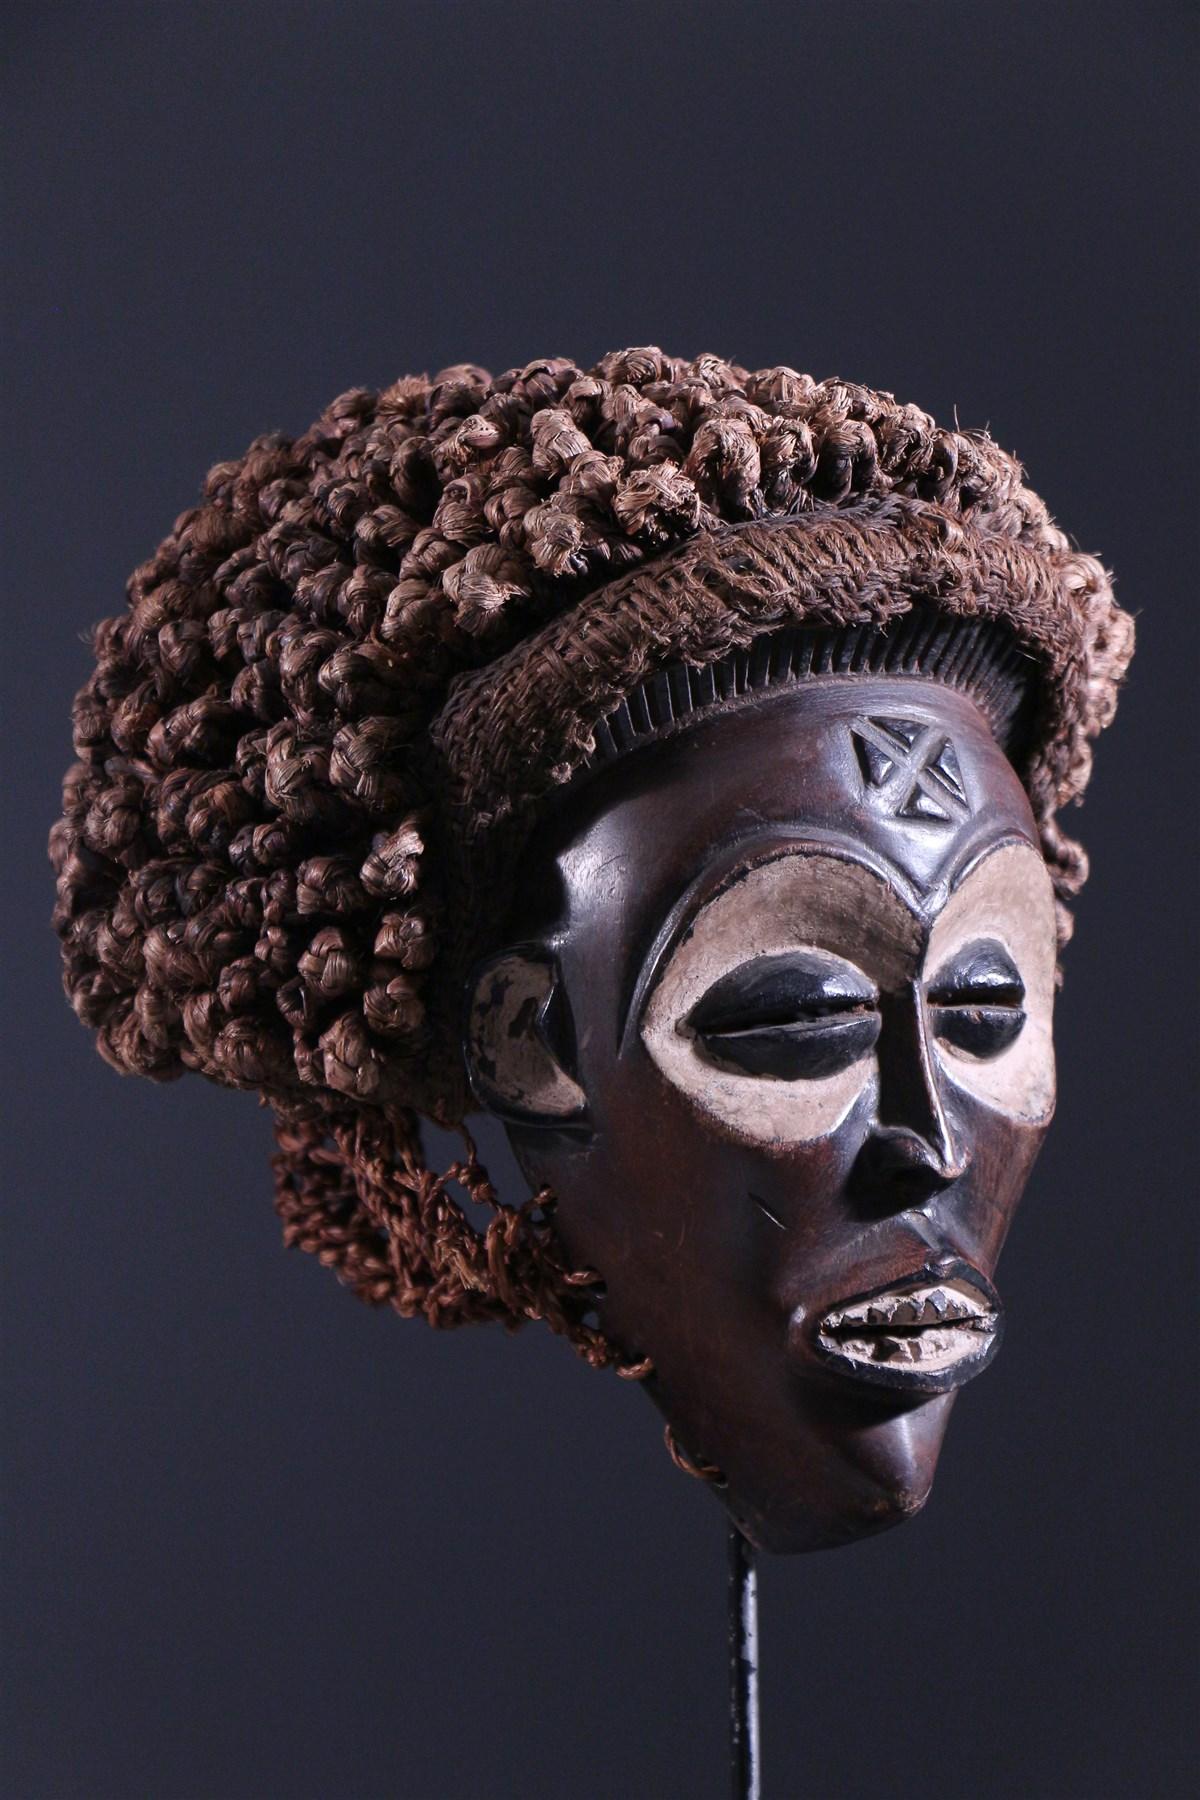 Masque Chokwe Mwana Pwo - Art africain